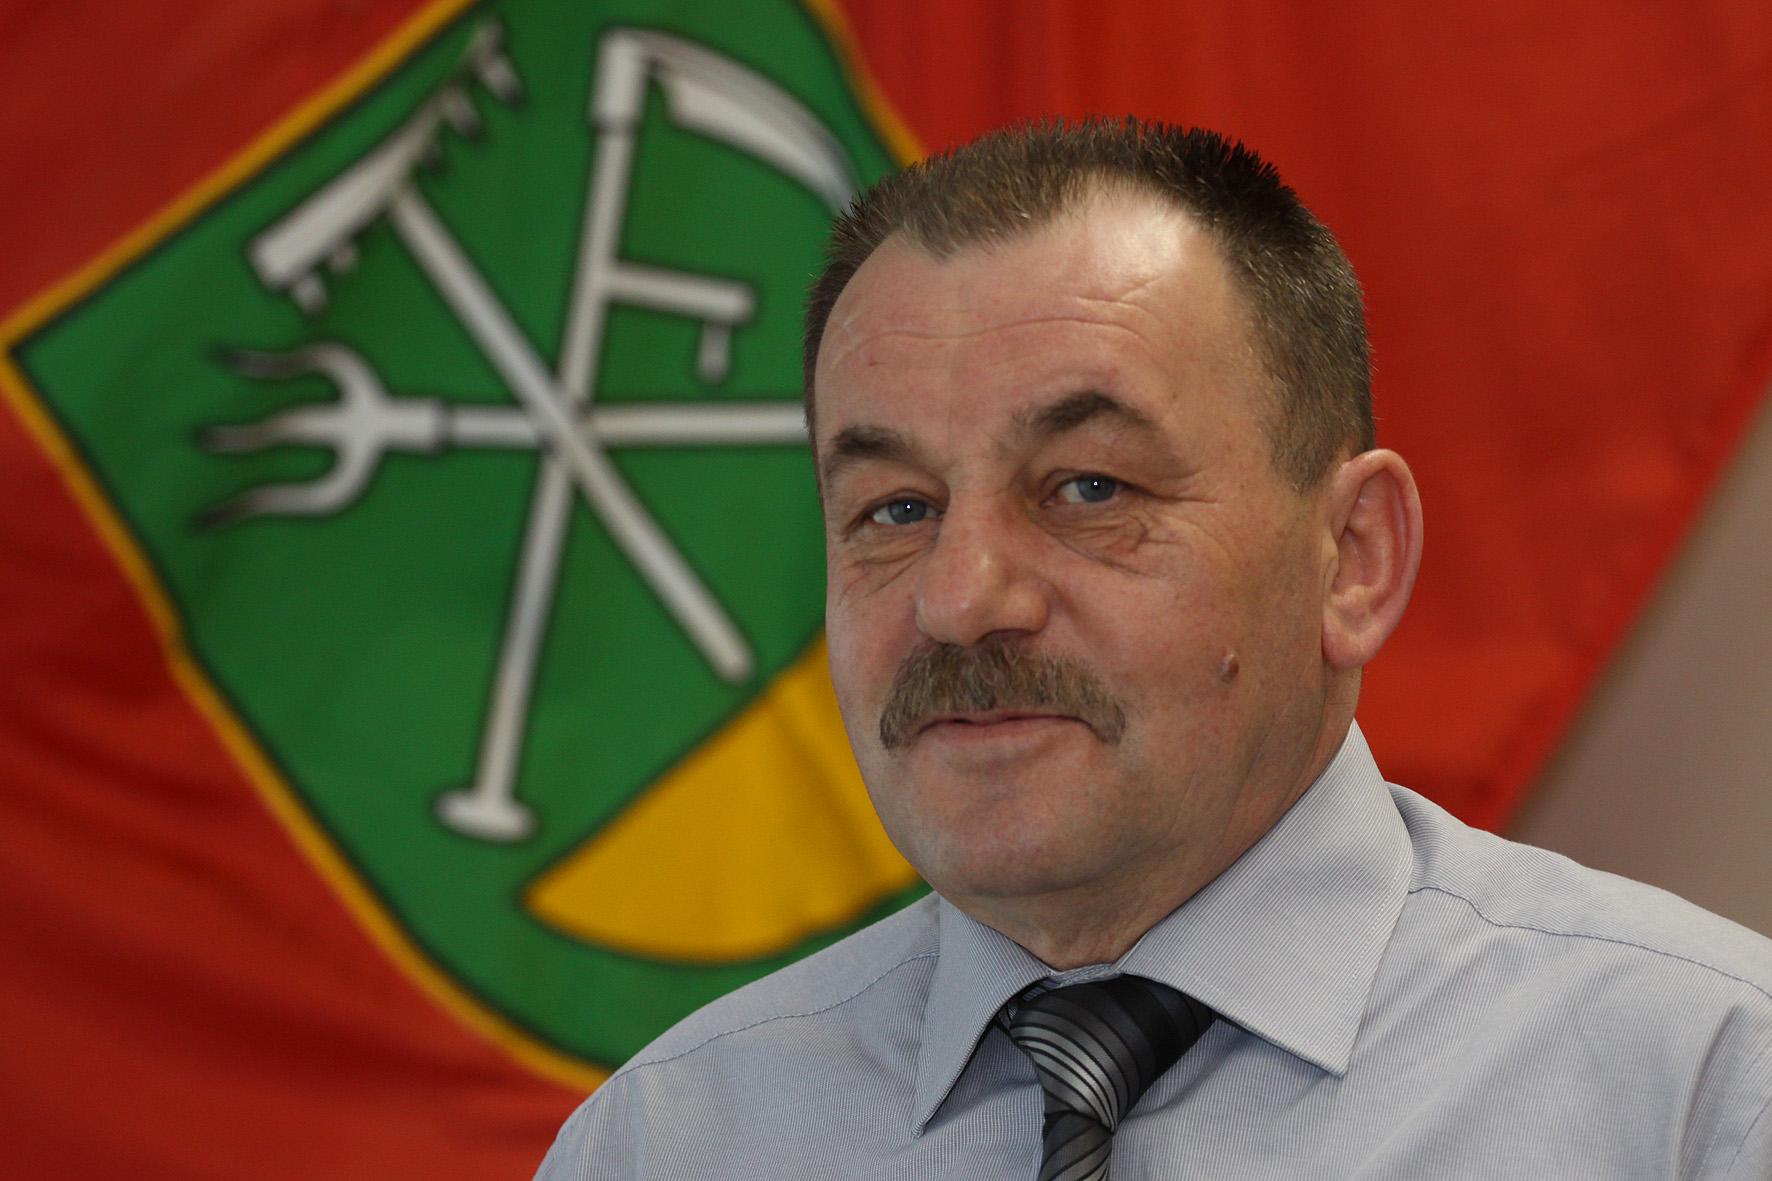 Mirko Rončević